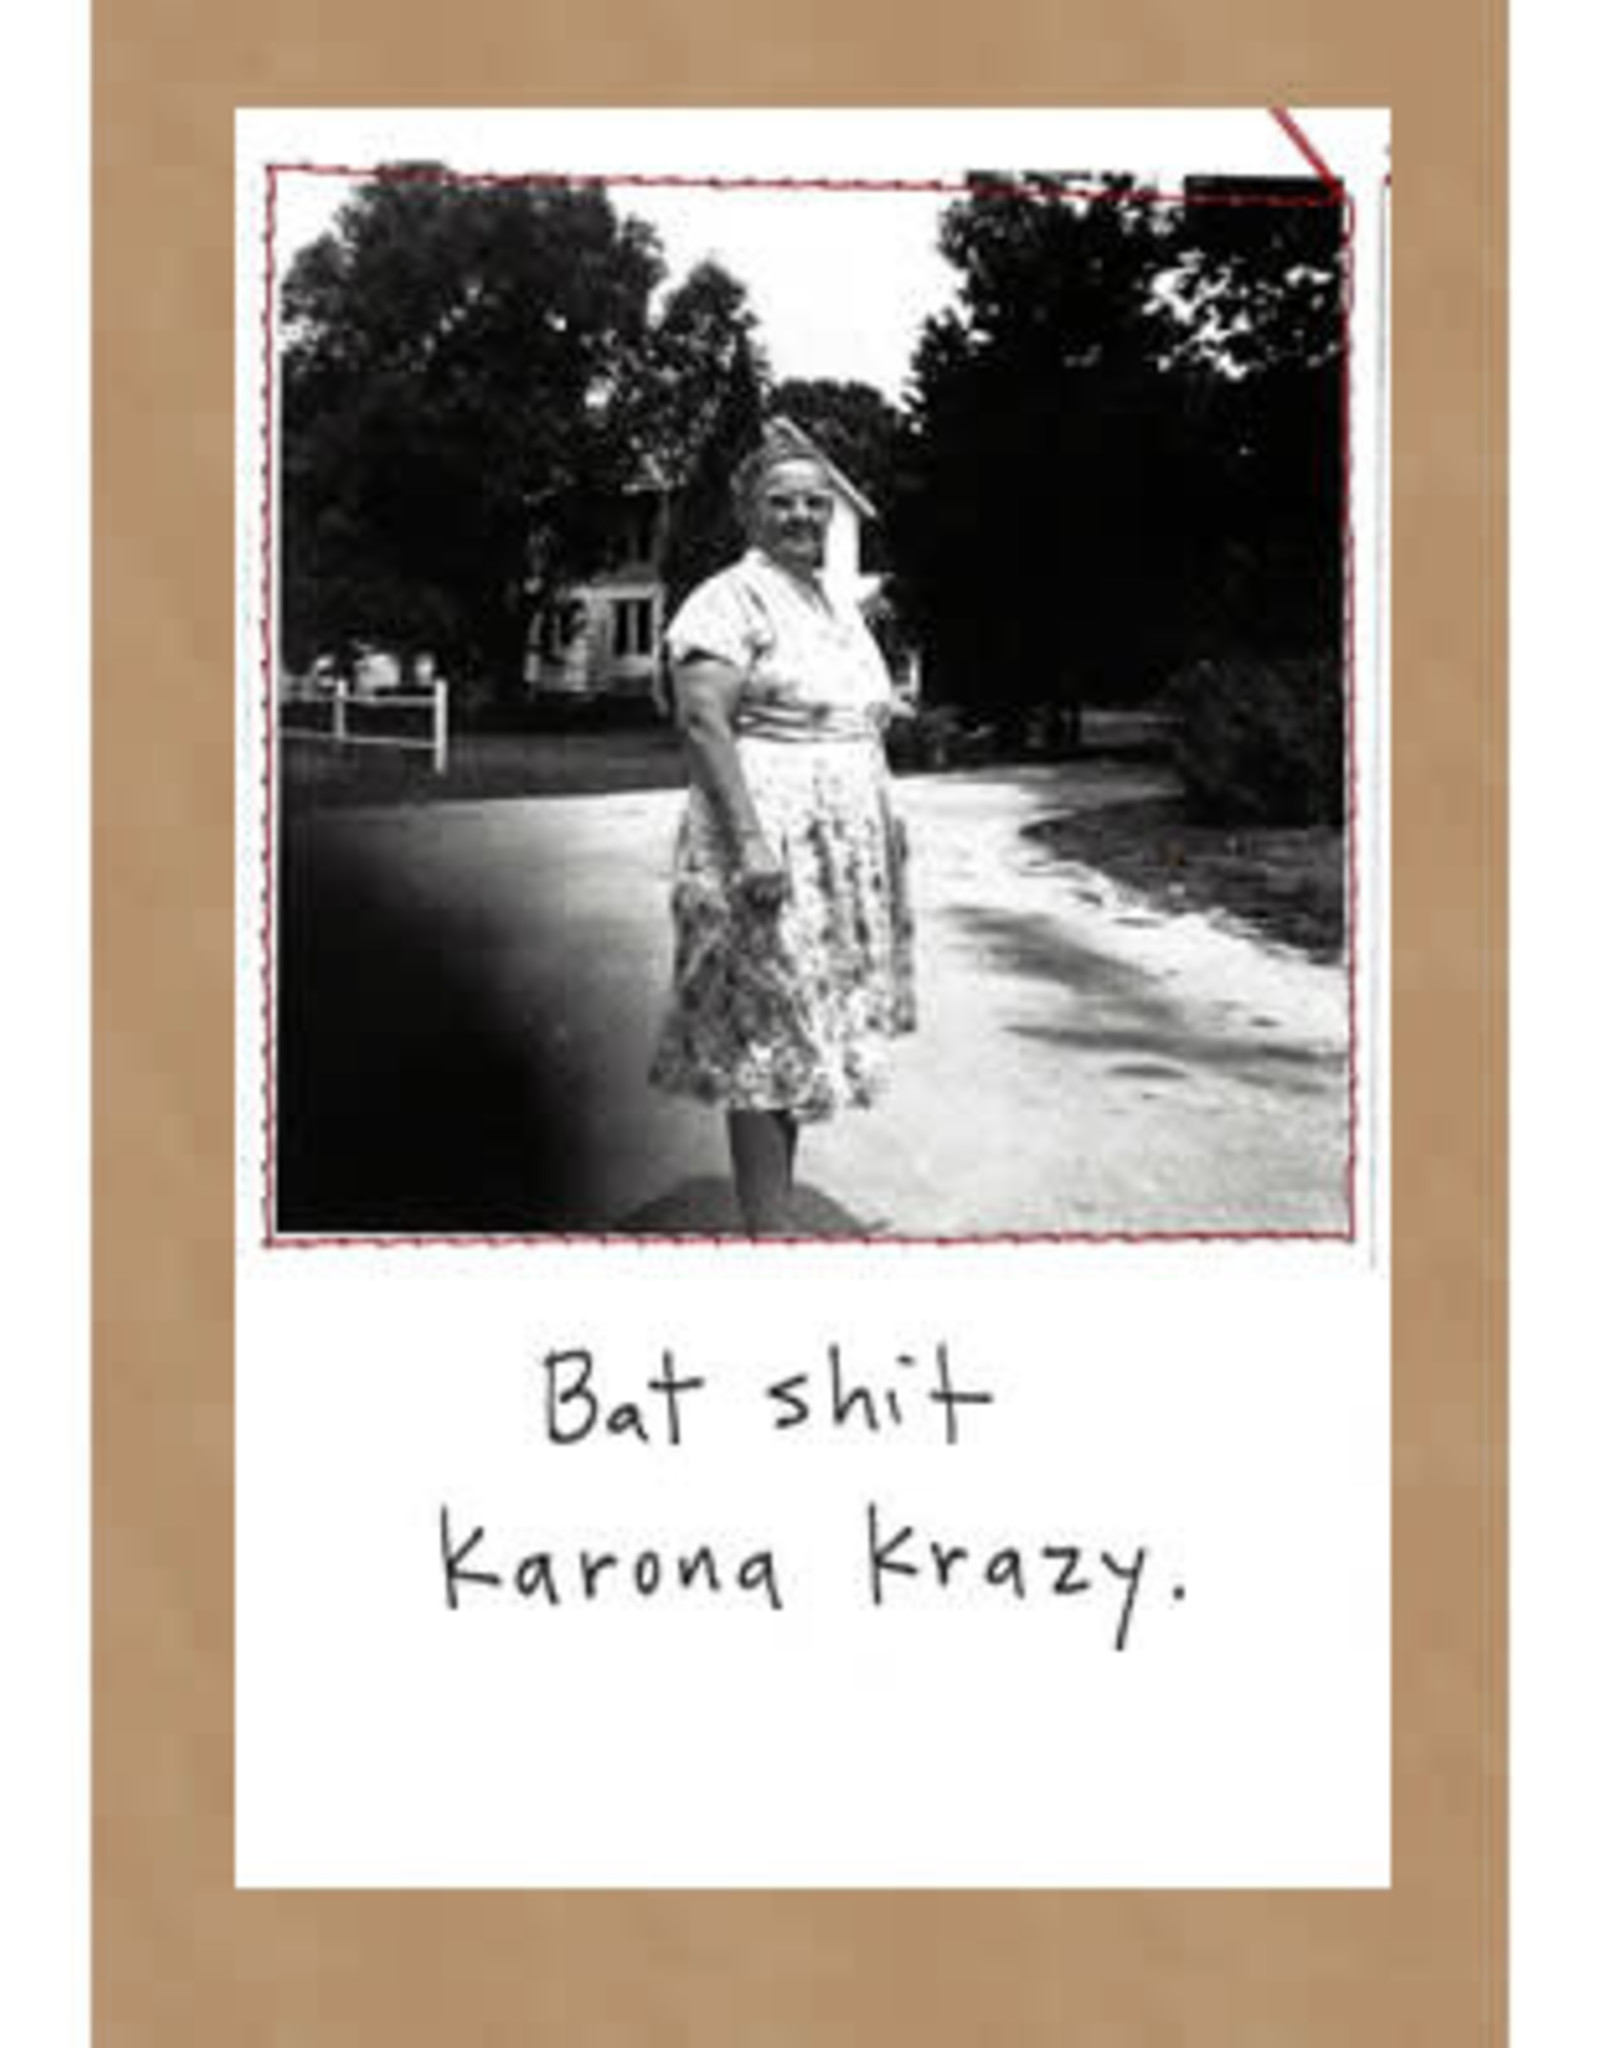 CARD-COVID HUMOR-KARONA CRAZY